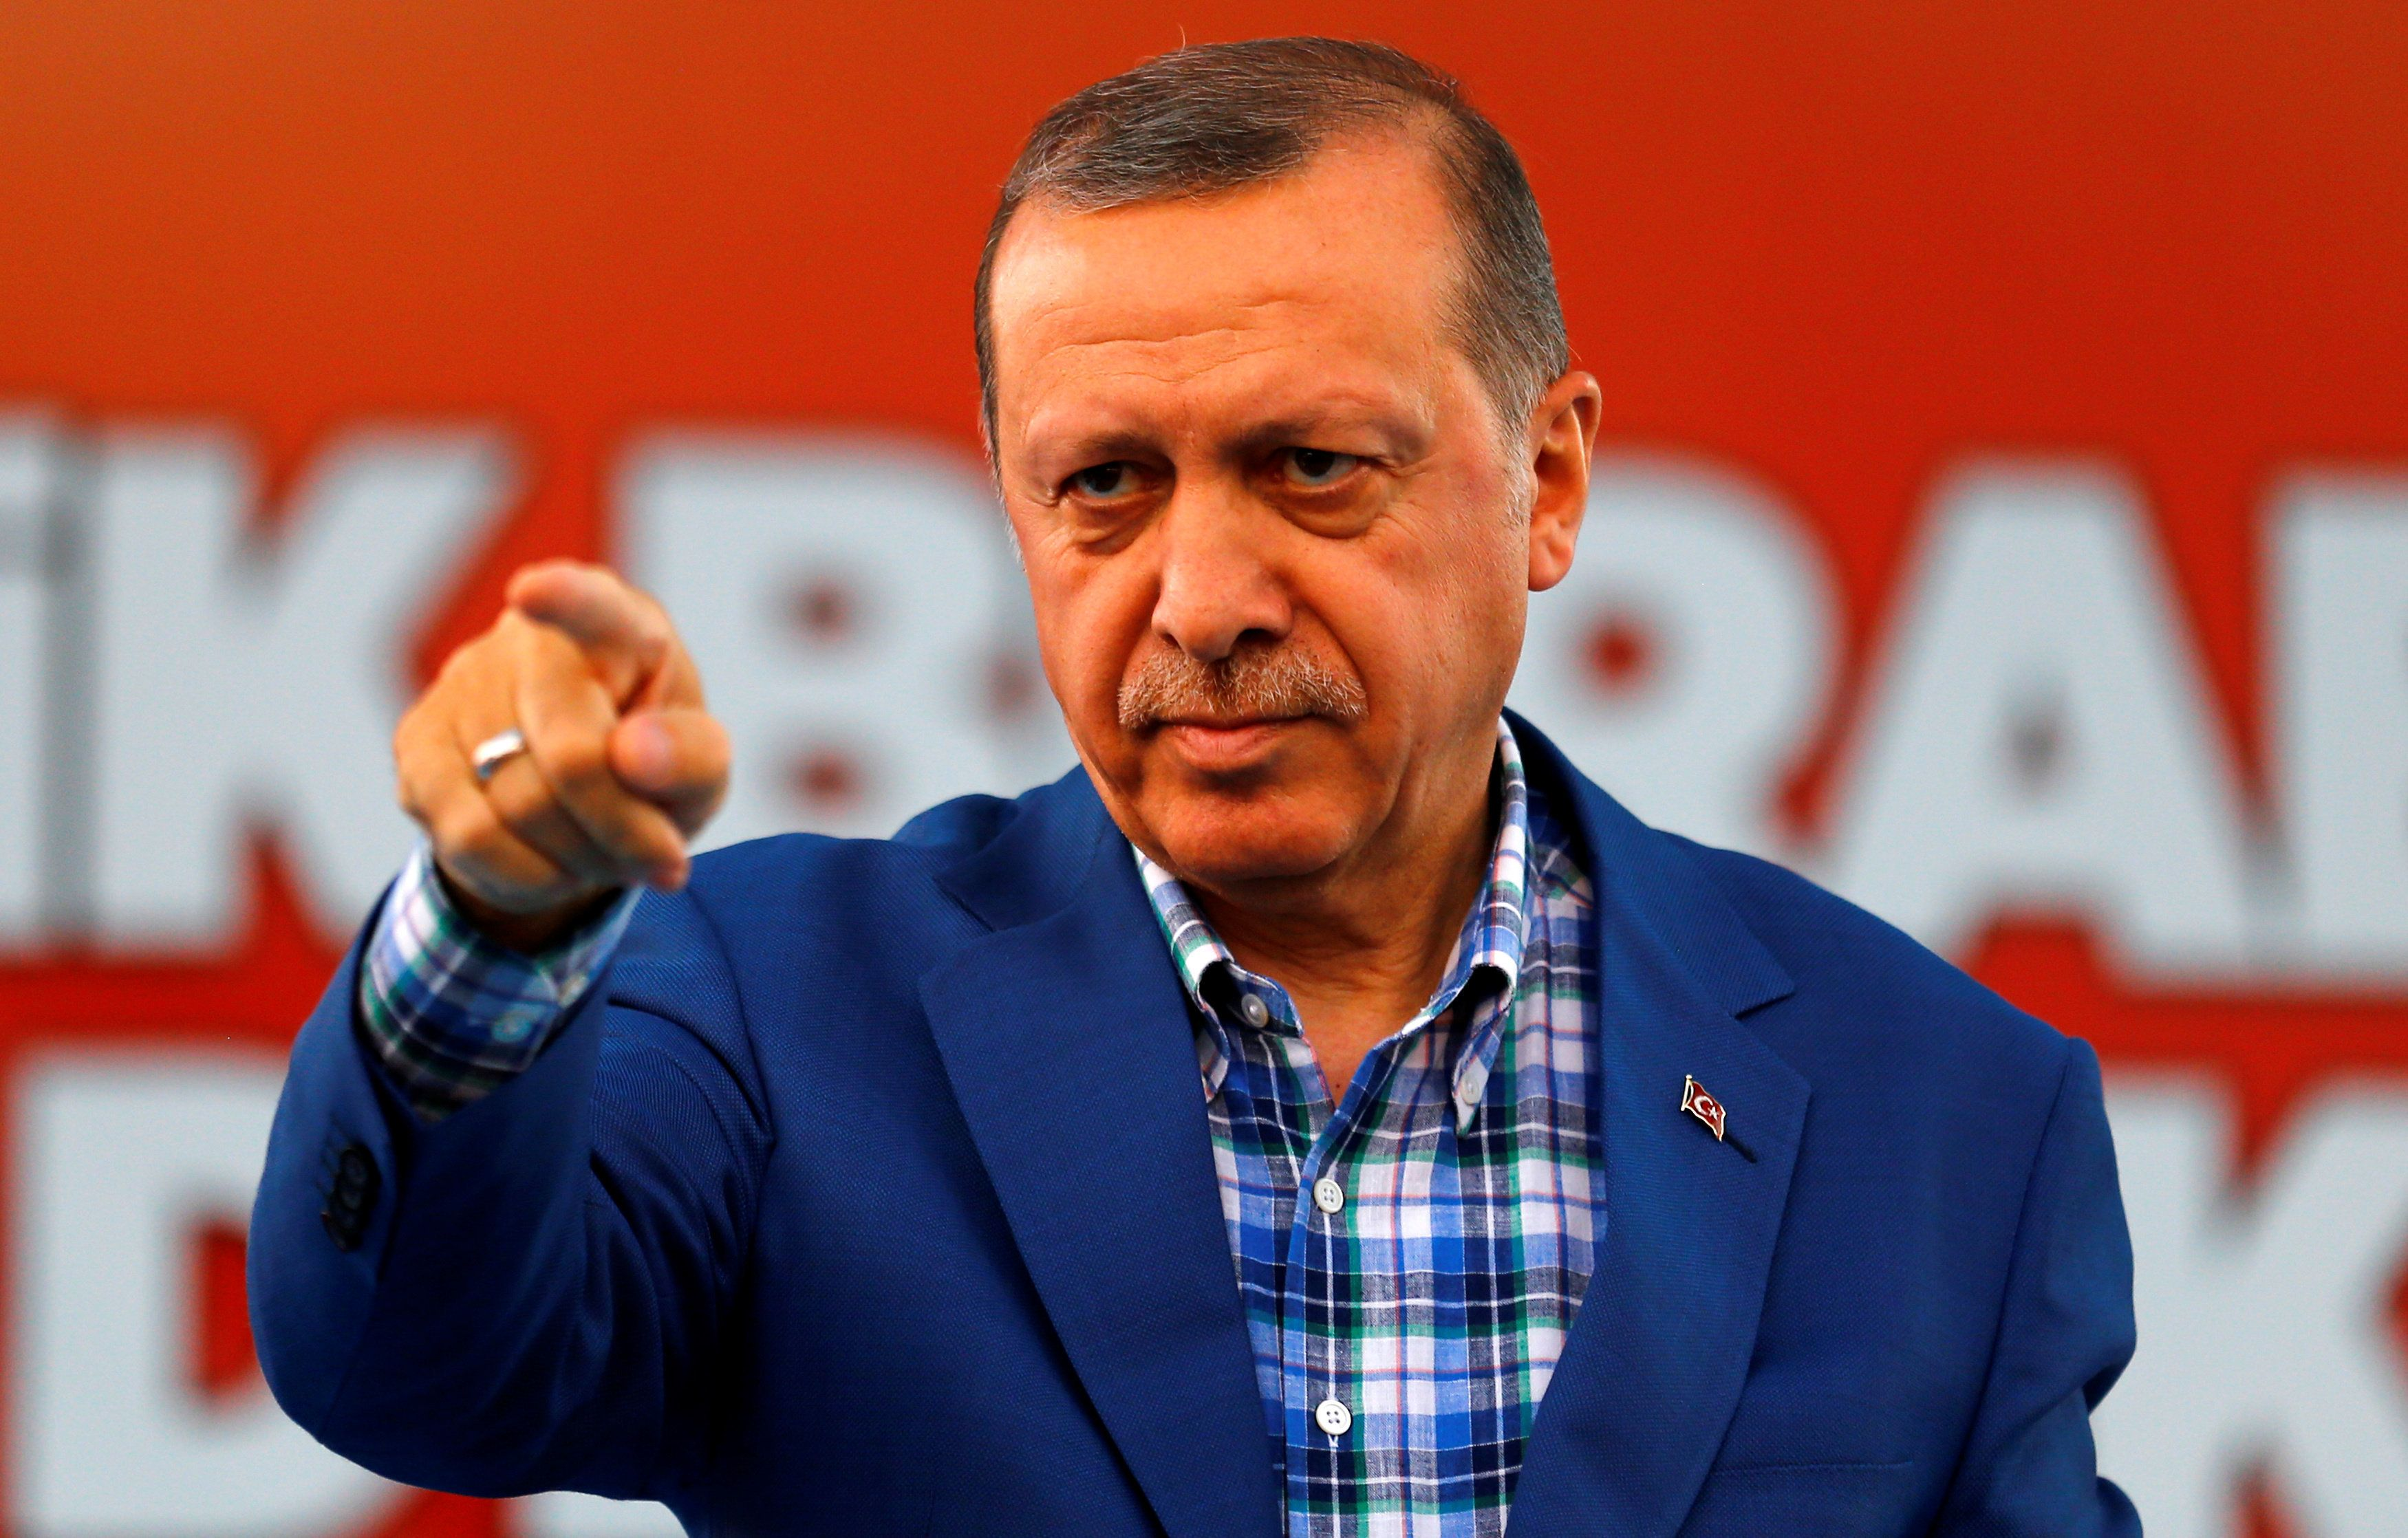 Turkey's President Tayyip Erdogan points at the United Solidarity and Brotherhood rally in Gaziantep, Turkey, August 28, 2016. REUTERS/Umit Bektas